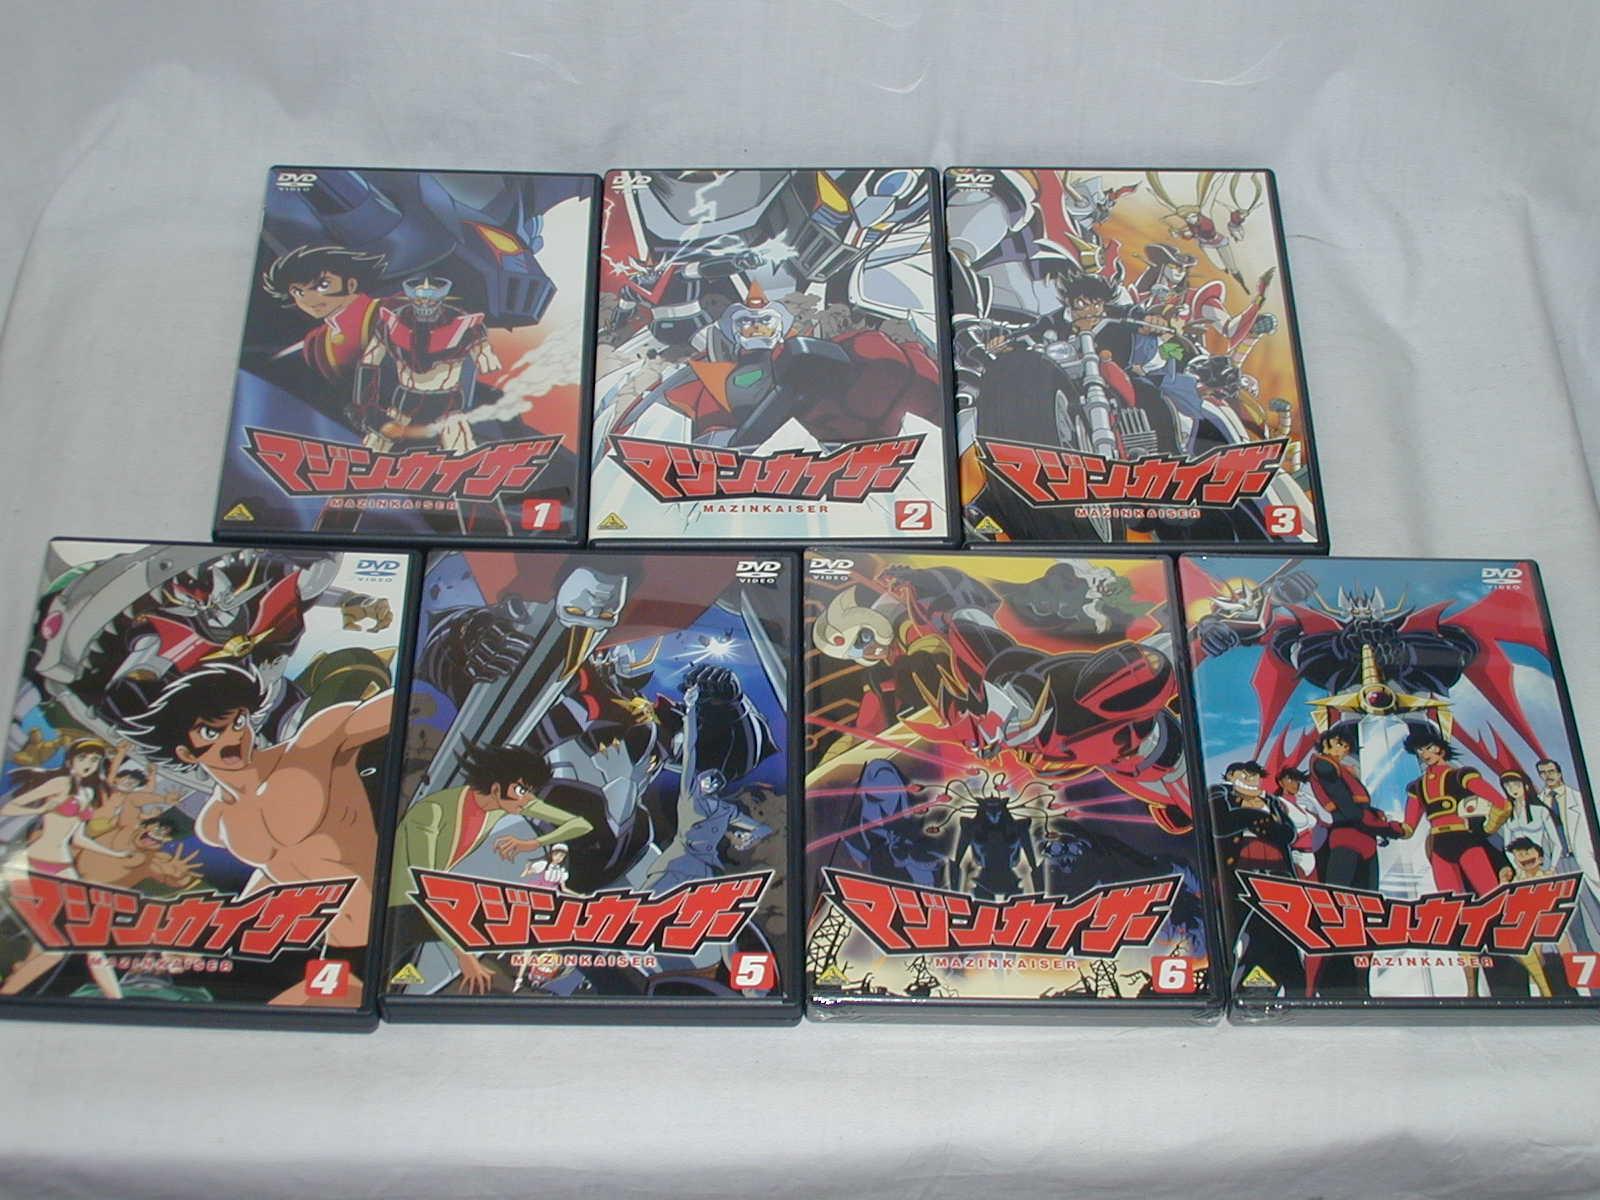 (DVD)マジンカイザー MAZINKAISER 全7巻セット